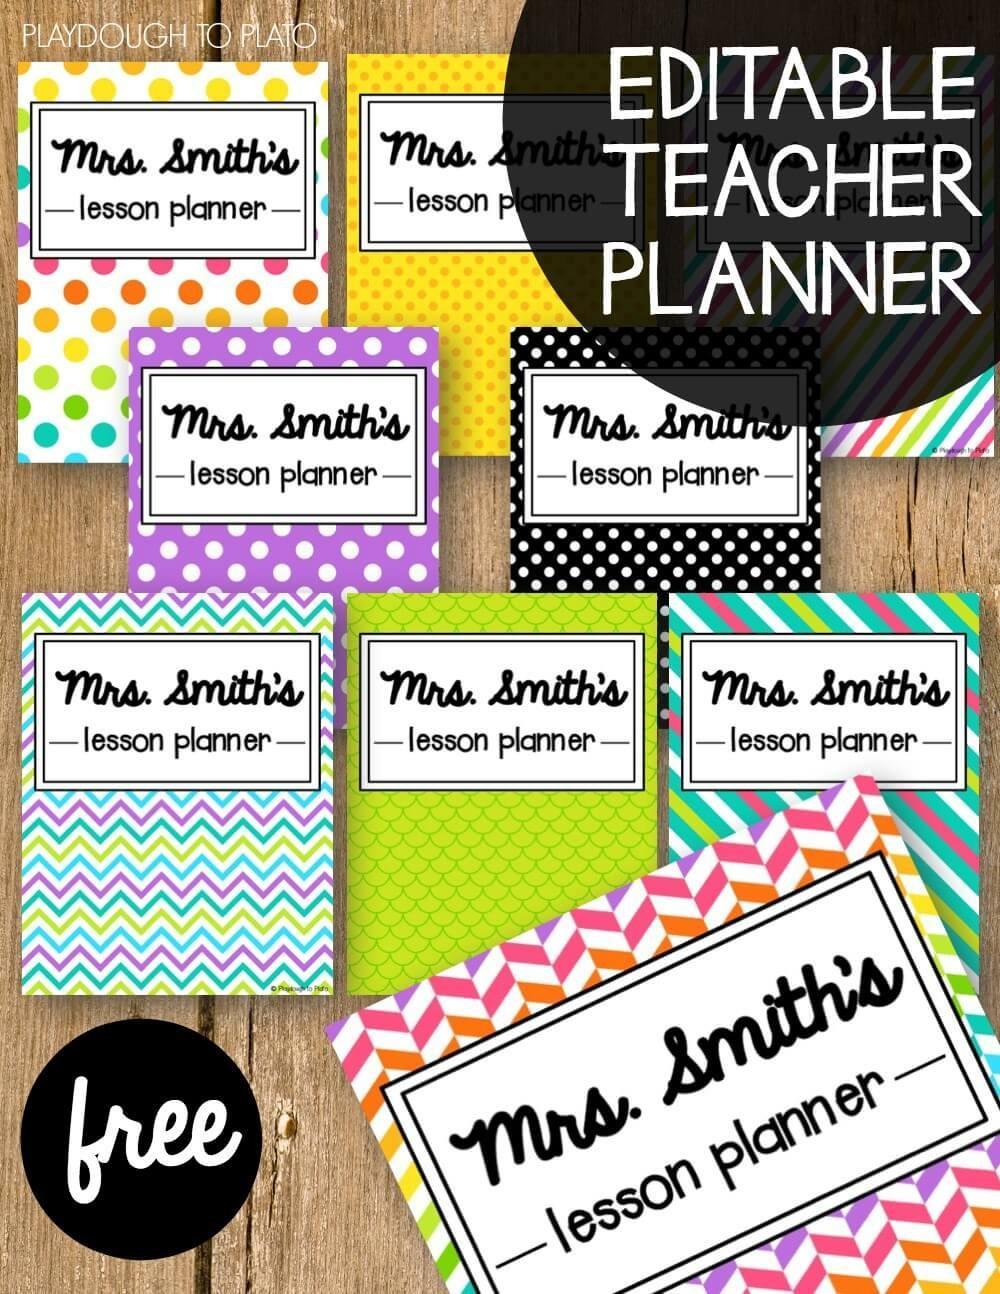 Free Teacher Planner - Playdough To Plato - Free Printables For Teachers